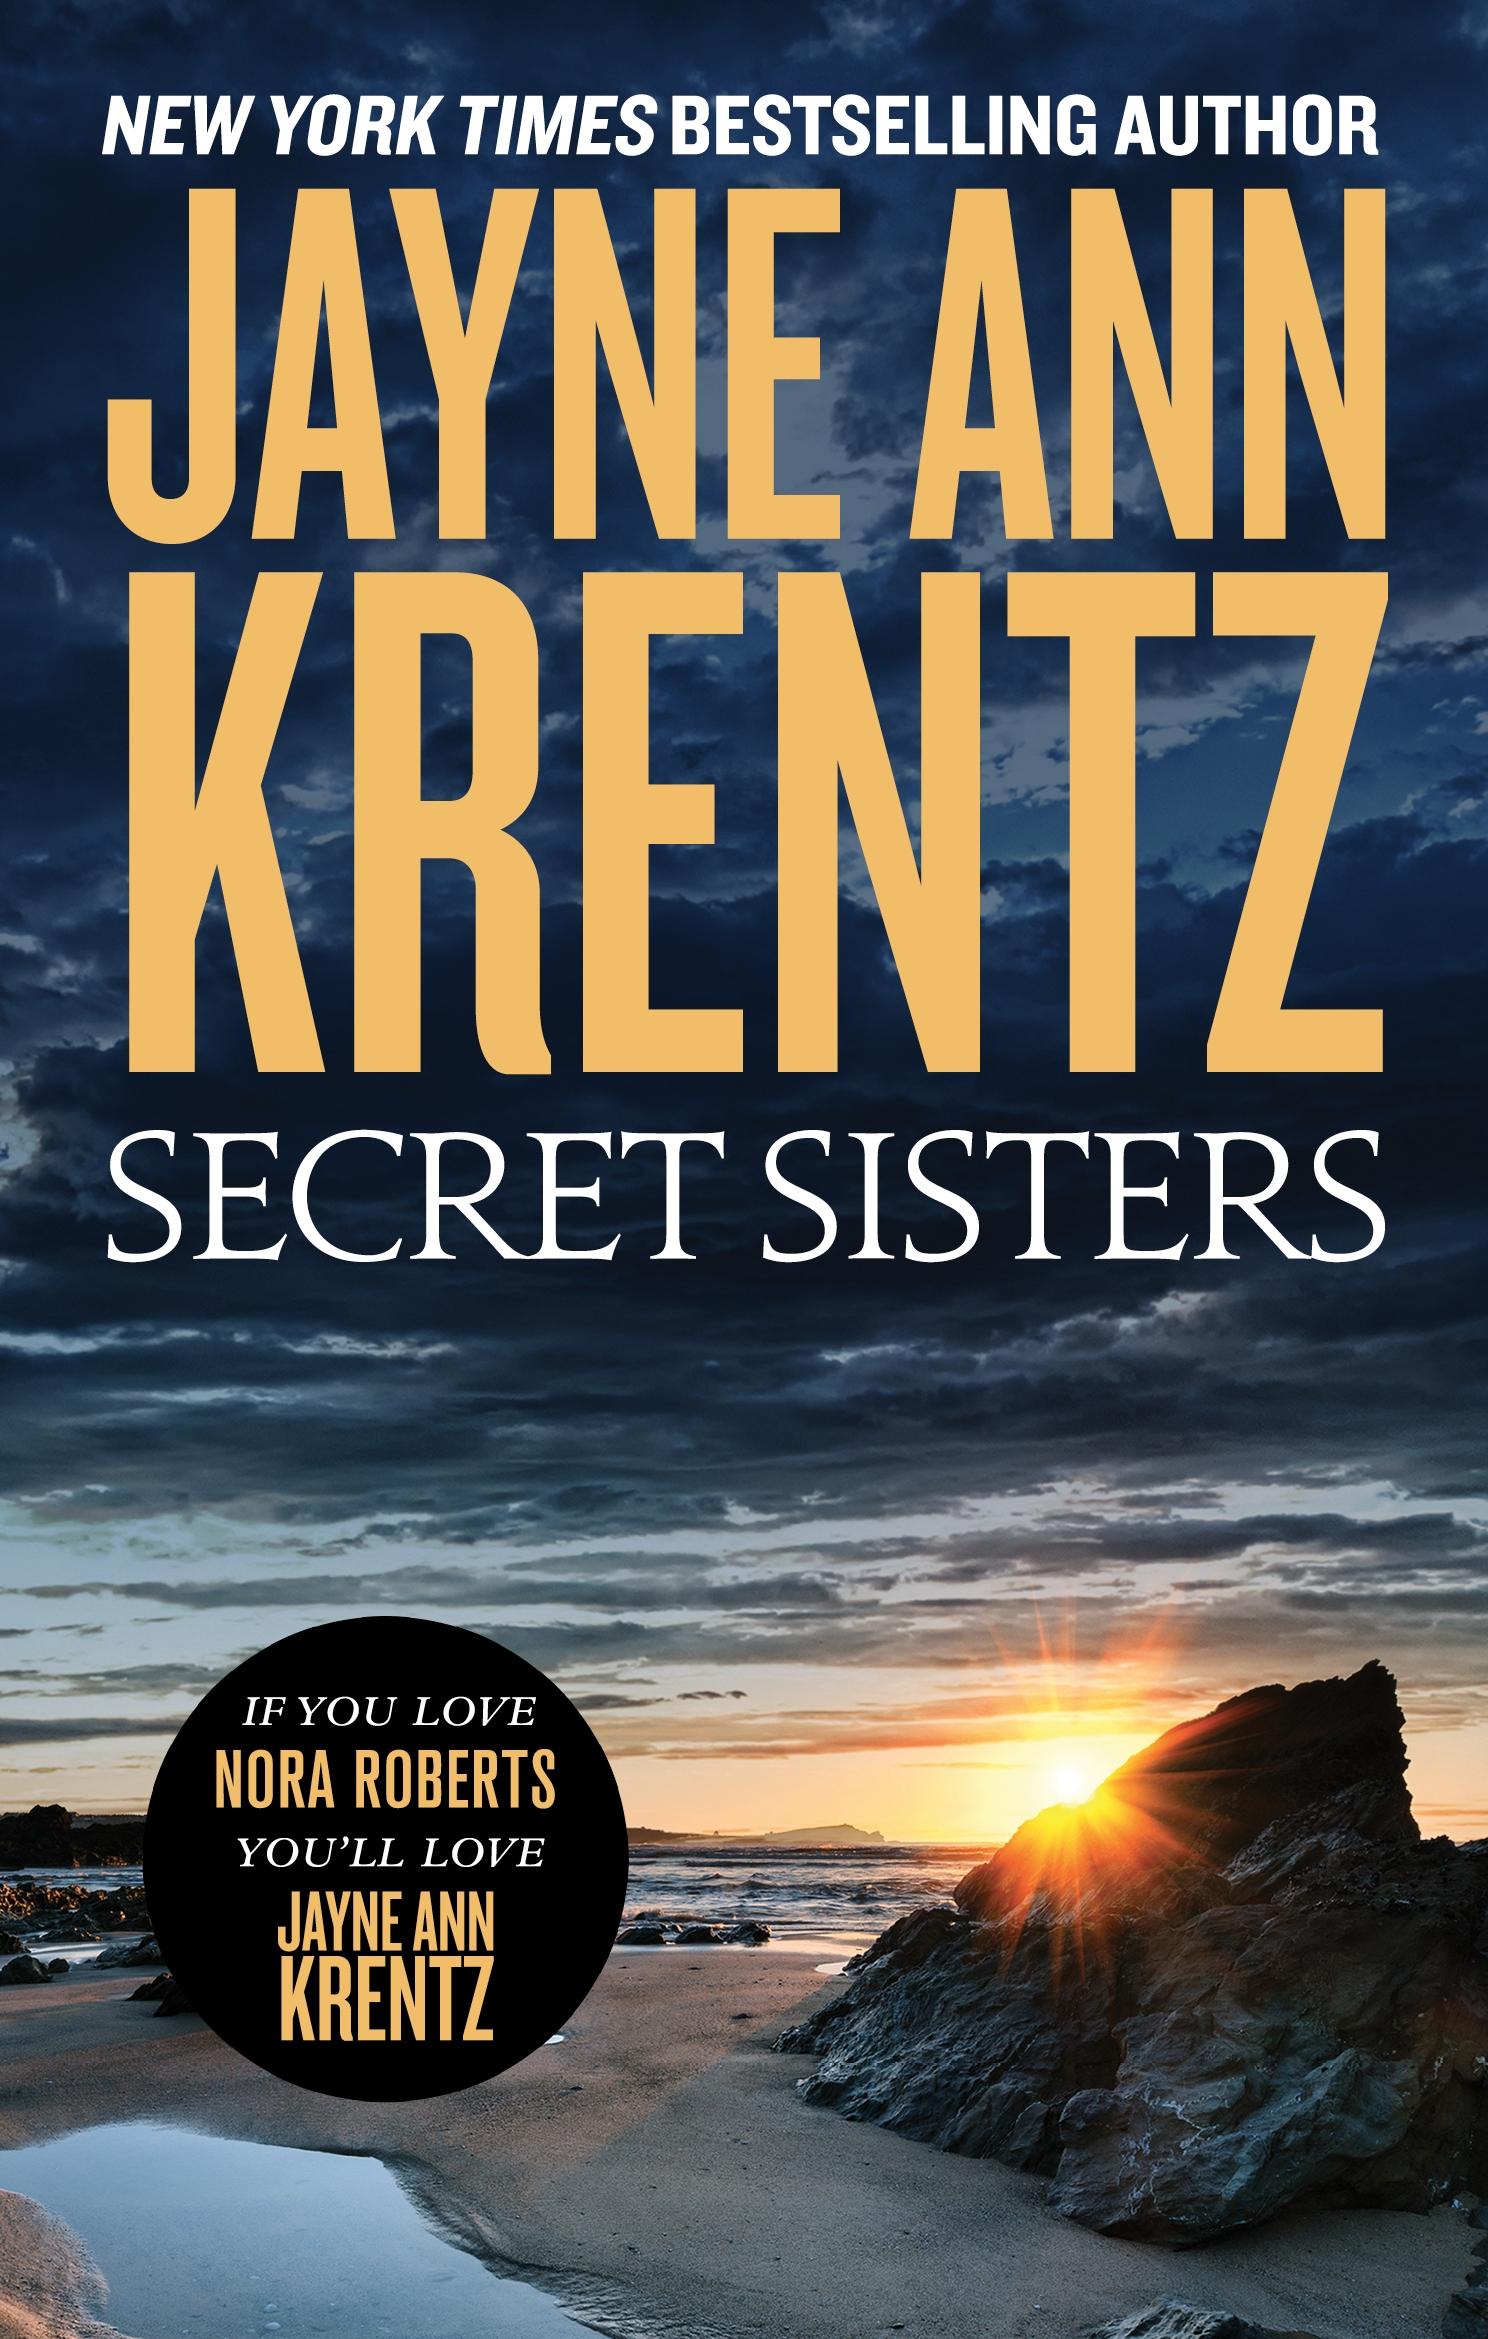 Secret Sisters | Jayne Ann Krentz | Salty Popcorn